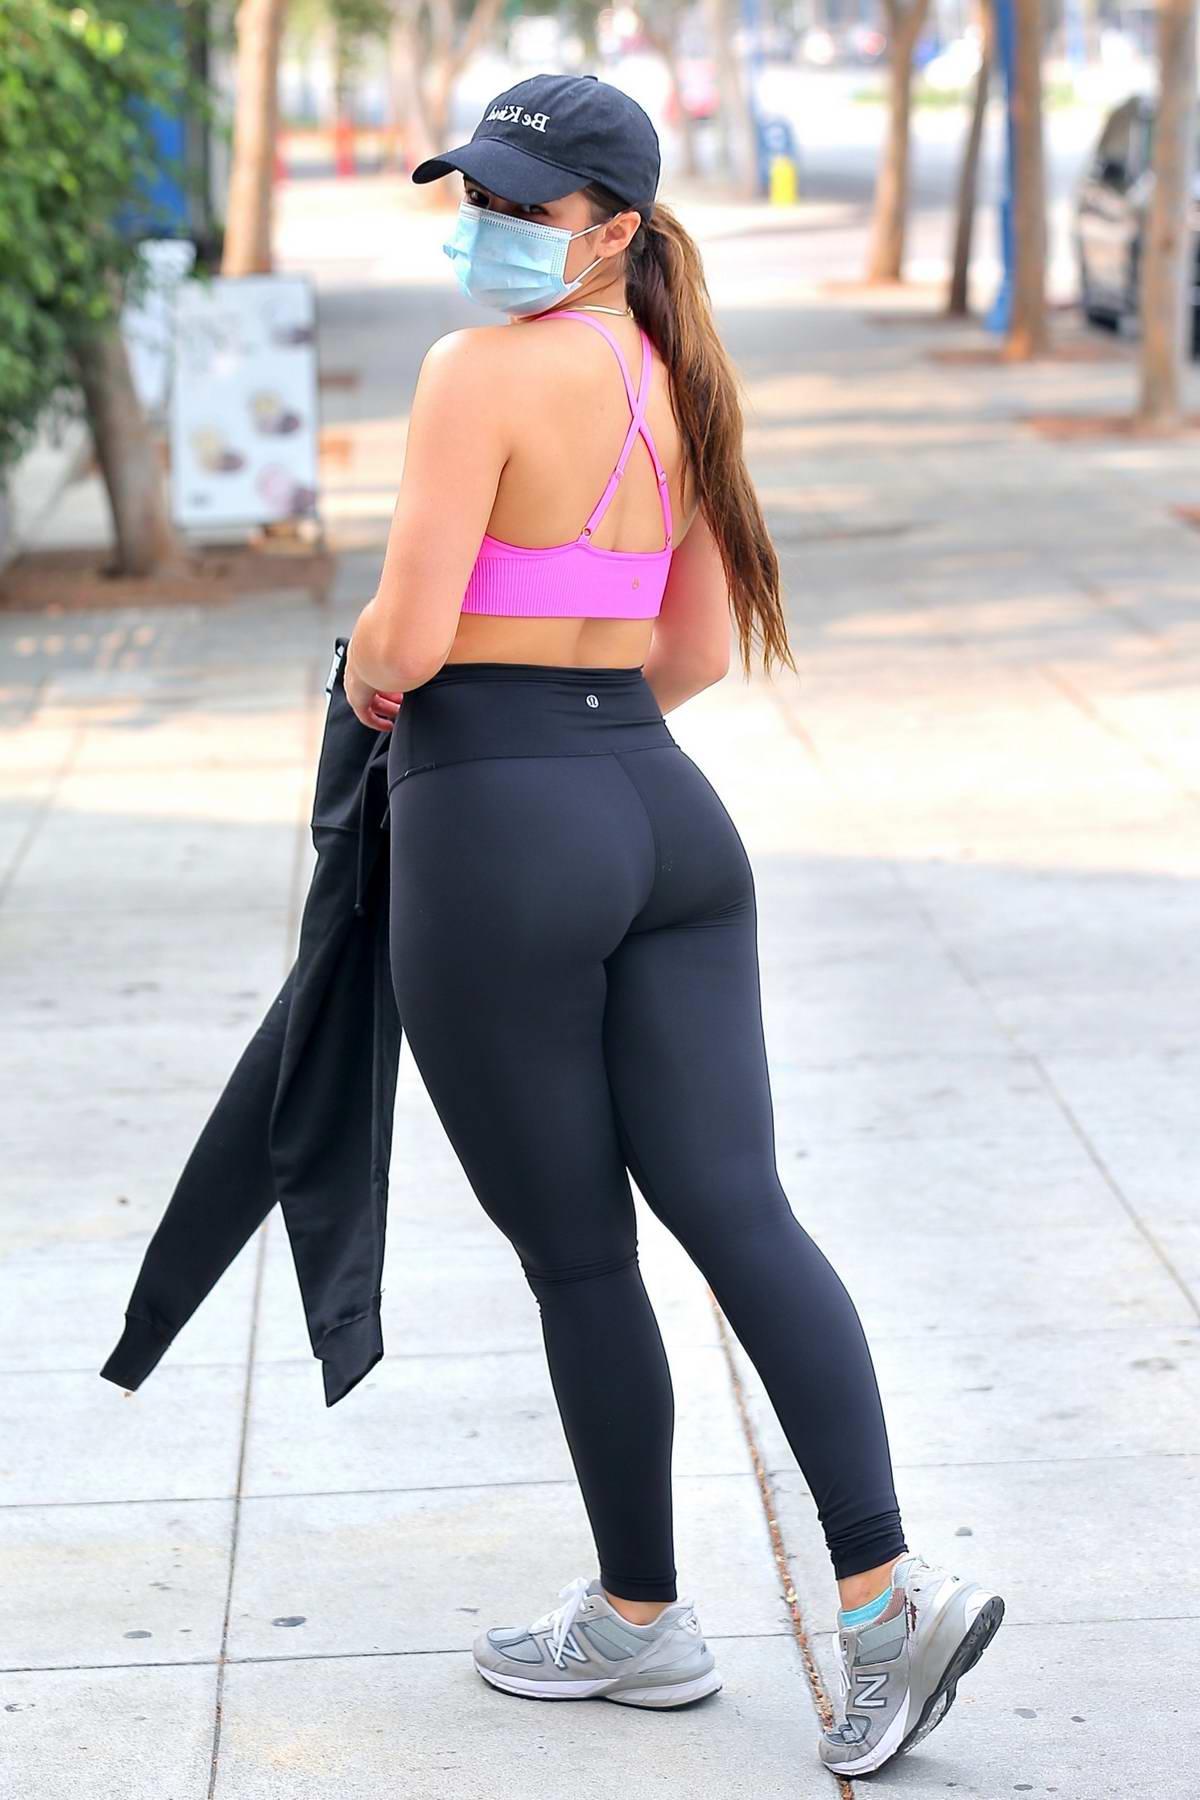 negro hot girl sex